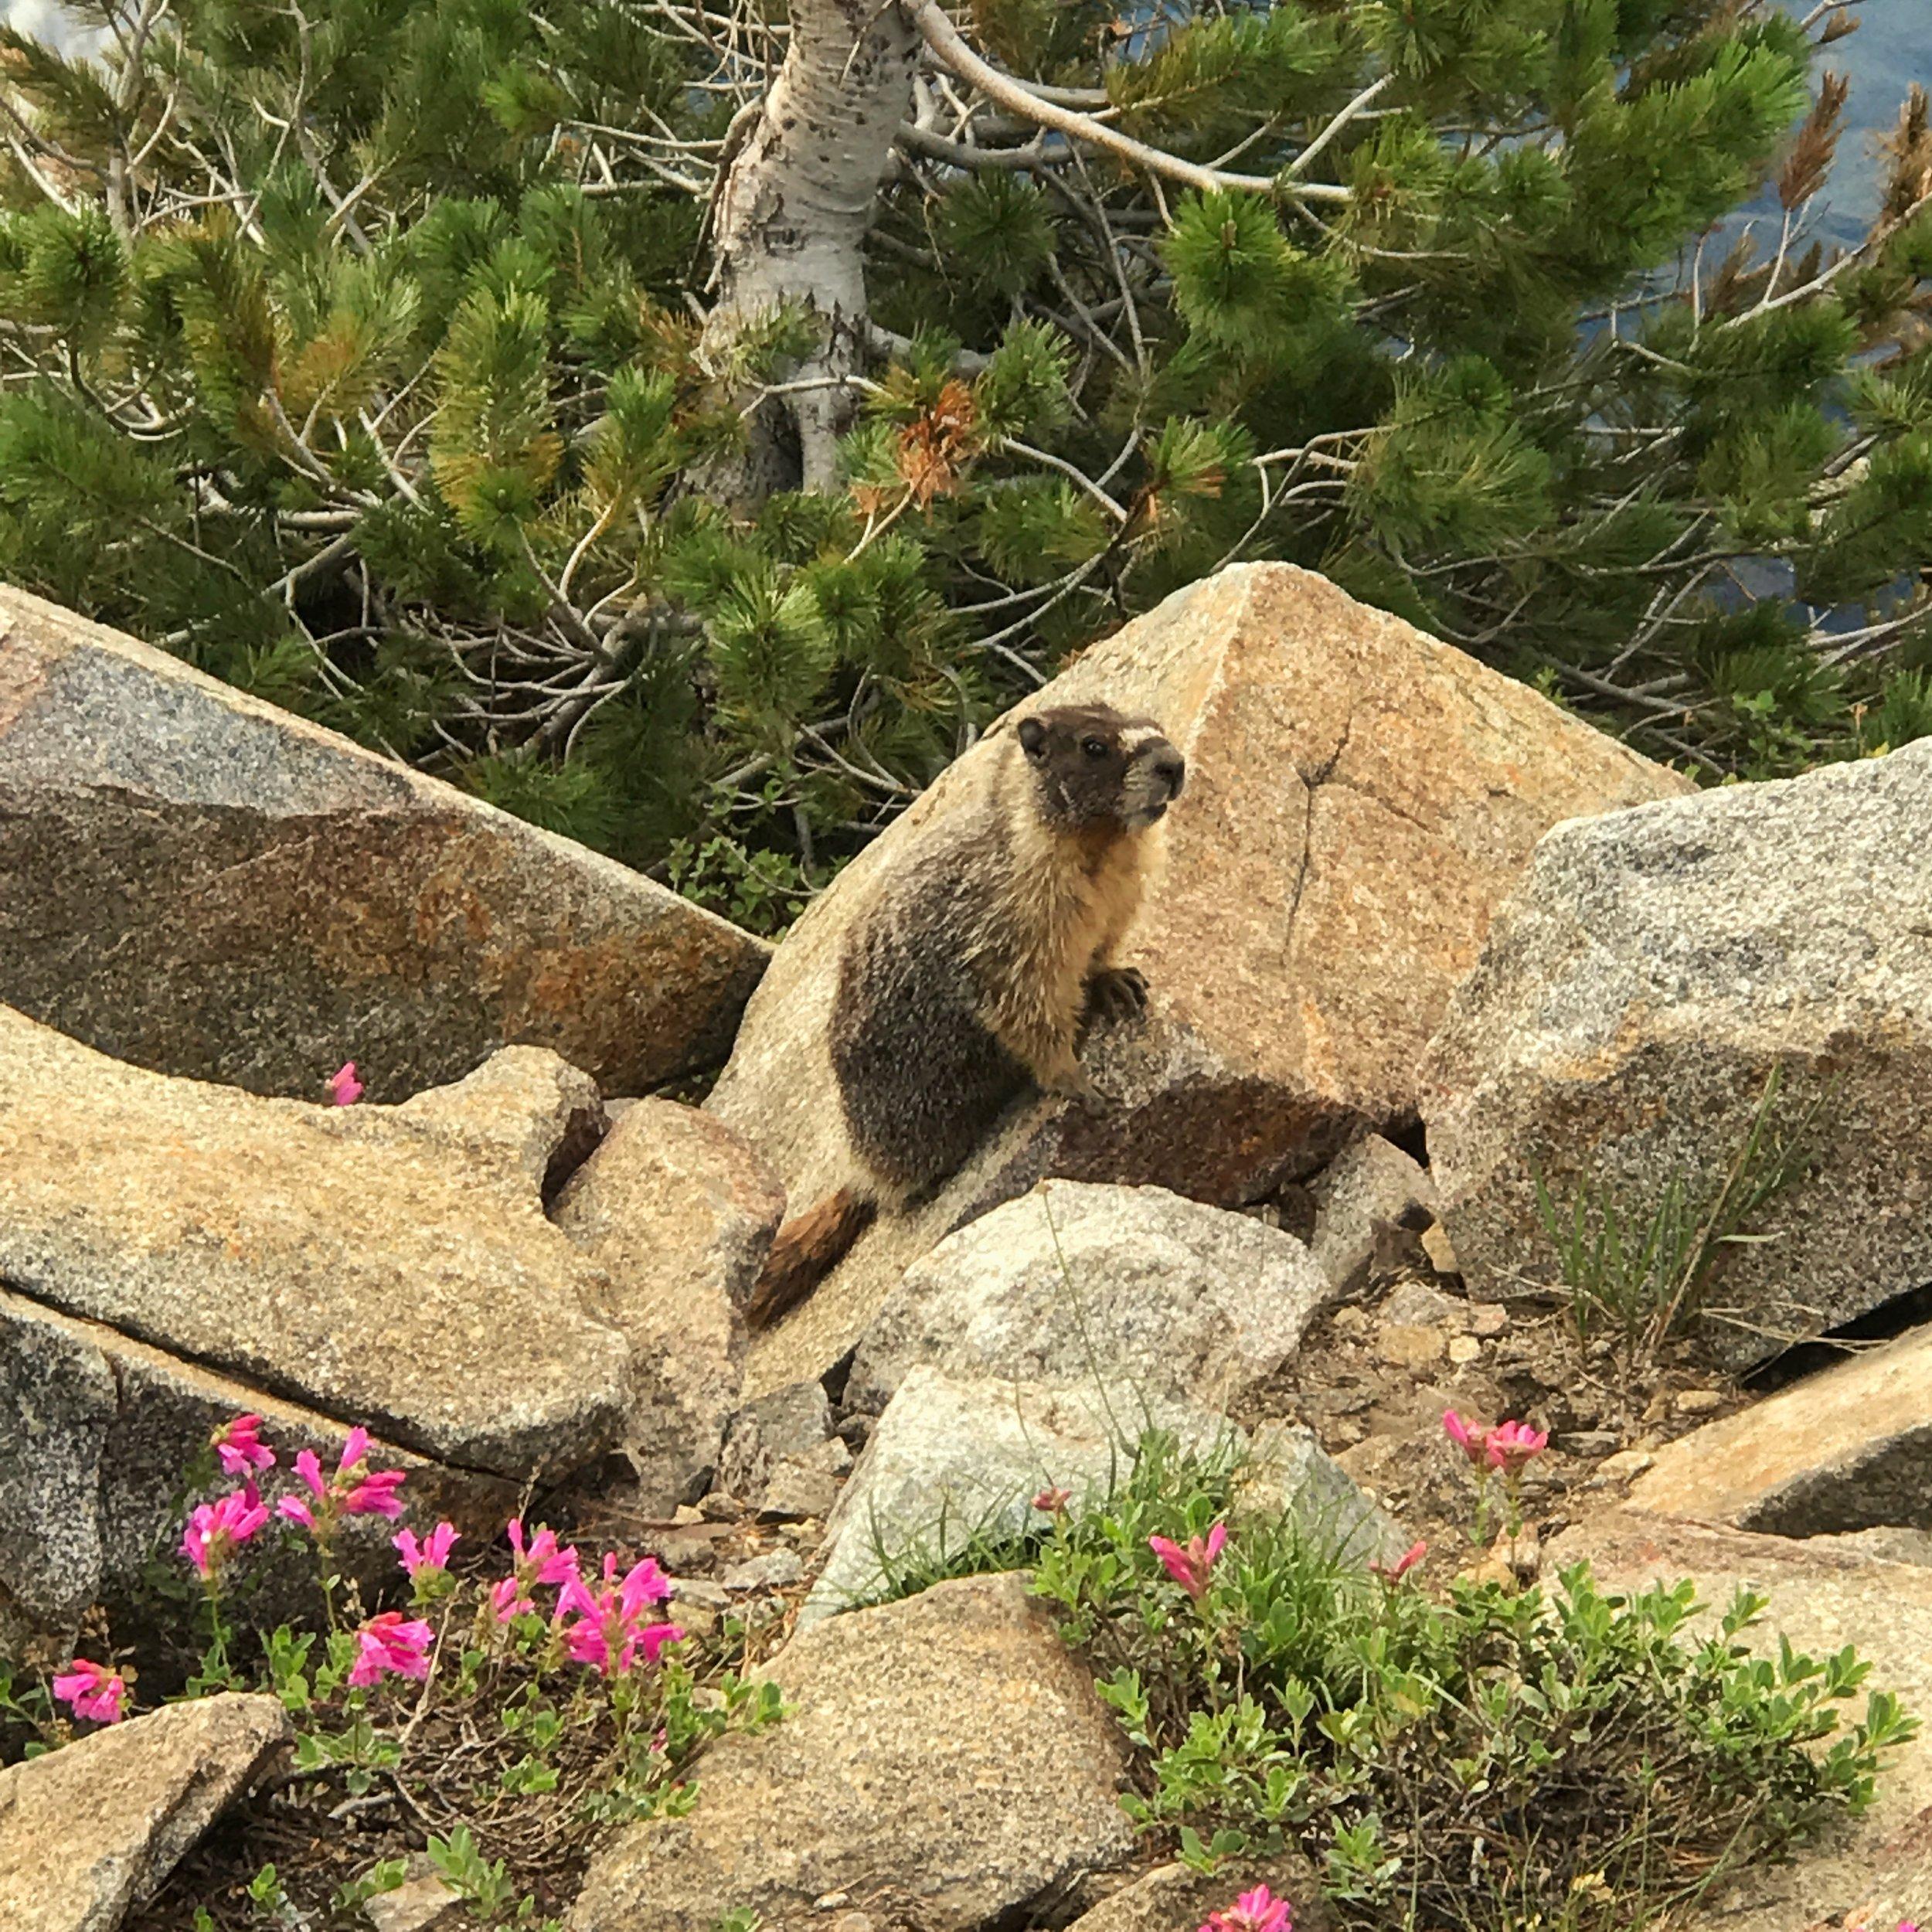 bob, the marmot